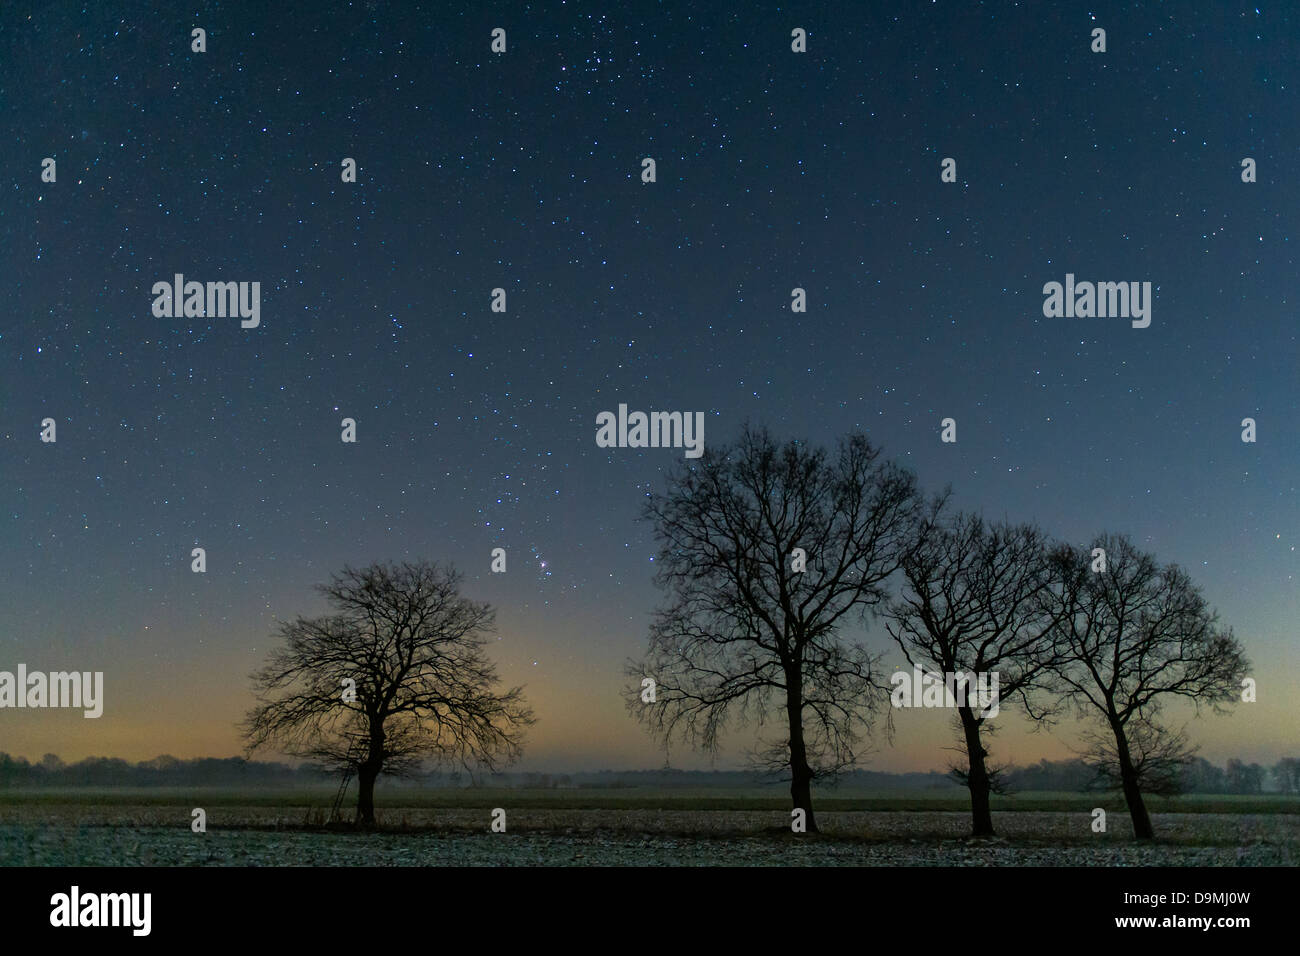 Star sky, stairy, stars, night, tree, scenic - Stock Image